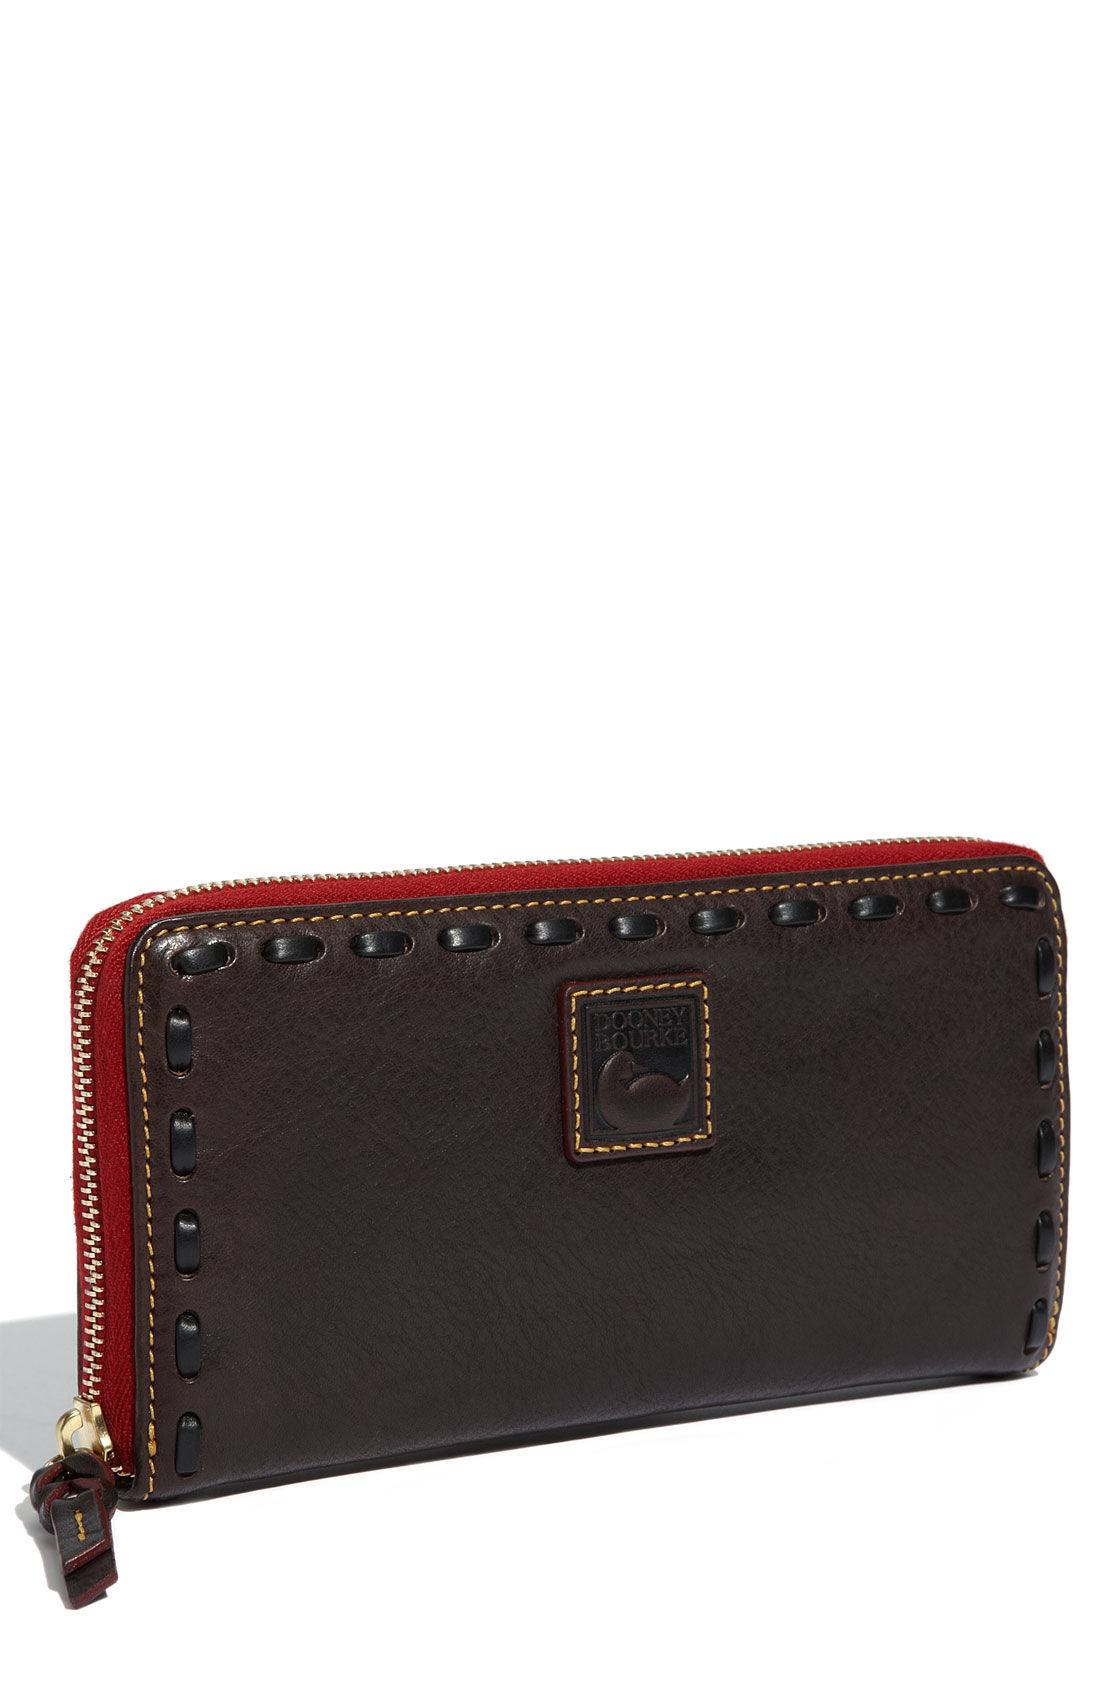 Nordstrom The Grove >> Dooney & Bourke Florentine - Large Zip Around Wallet in Brown (brown tmoro) | Lyst